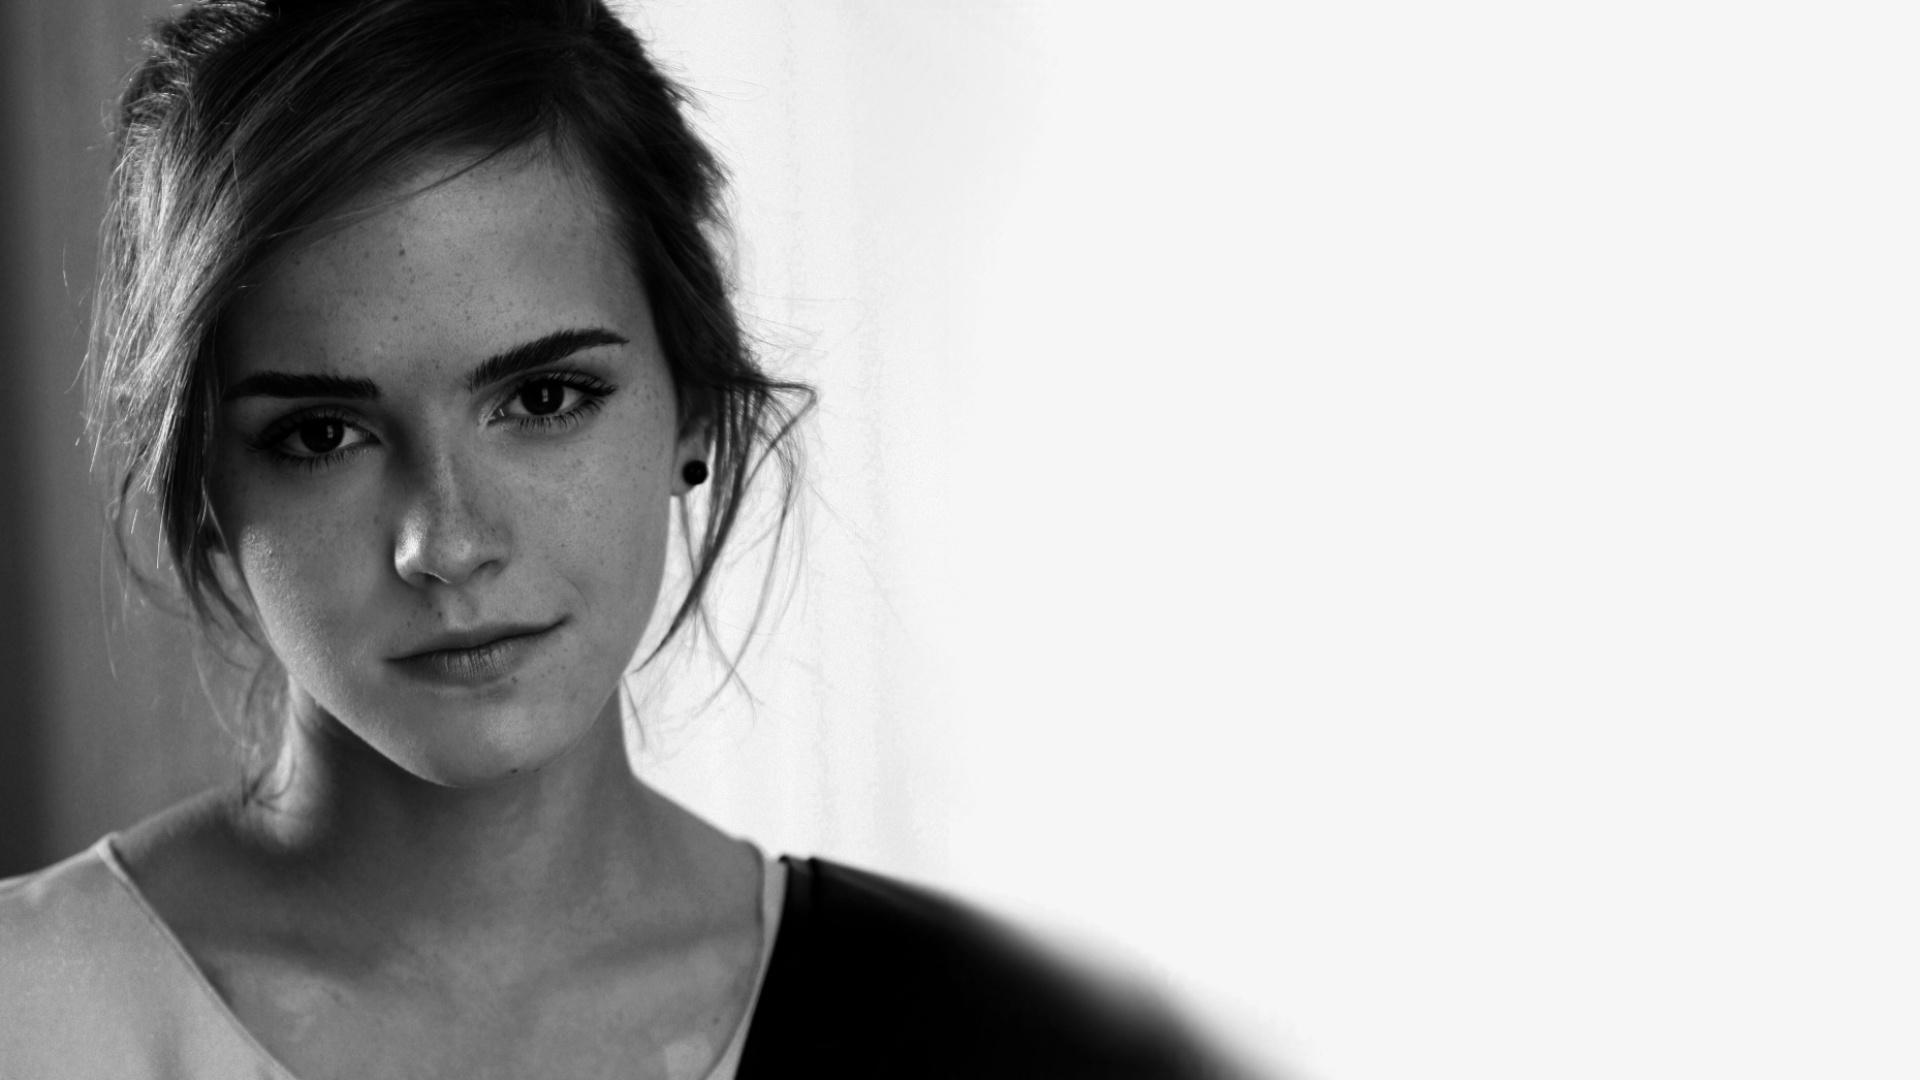 48 Emma Watson Iphone Wallpaper On Wallpapersafari